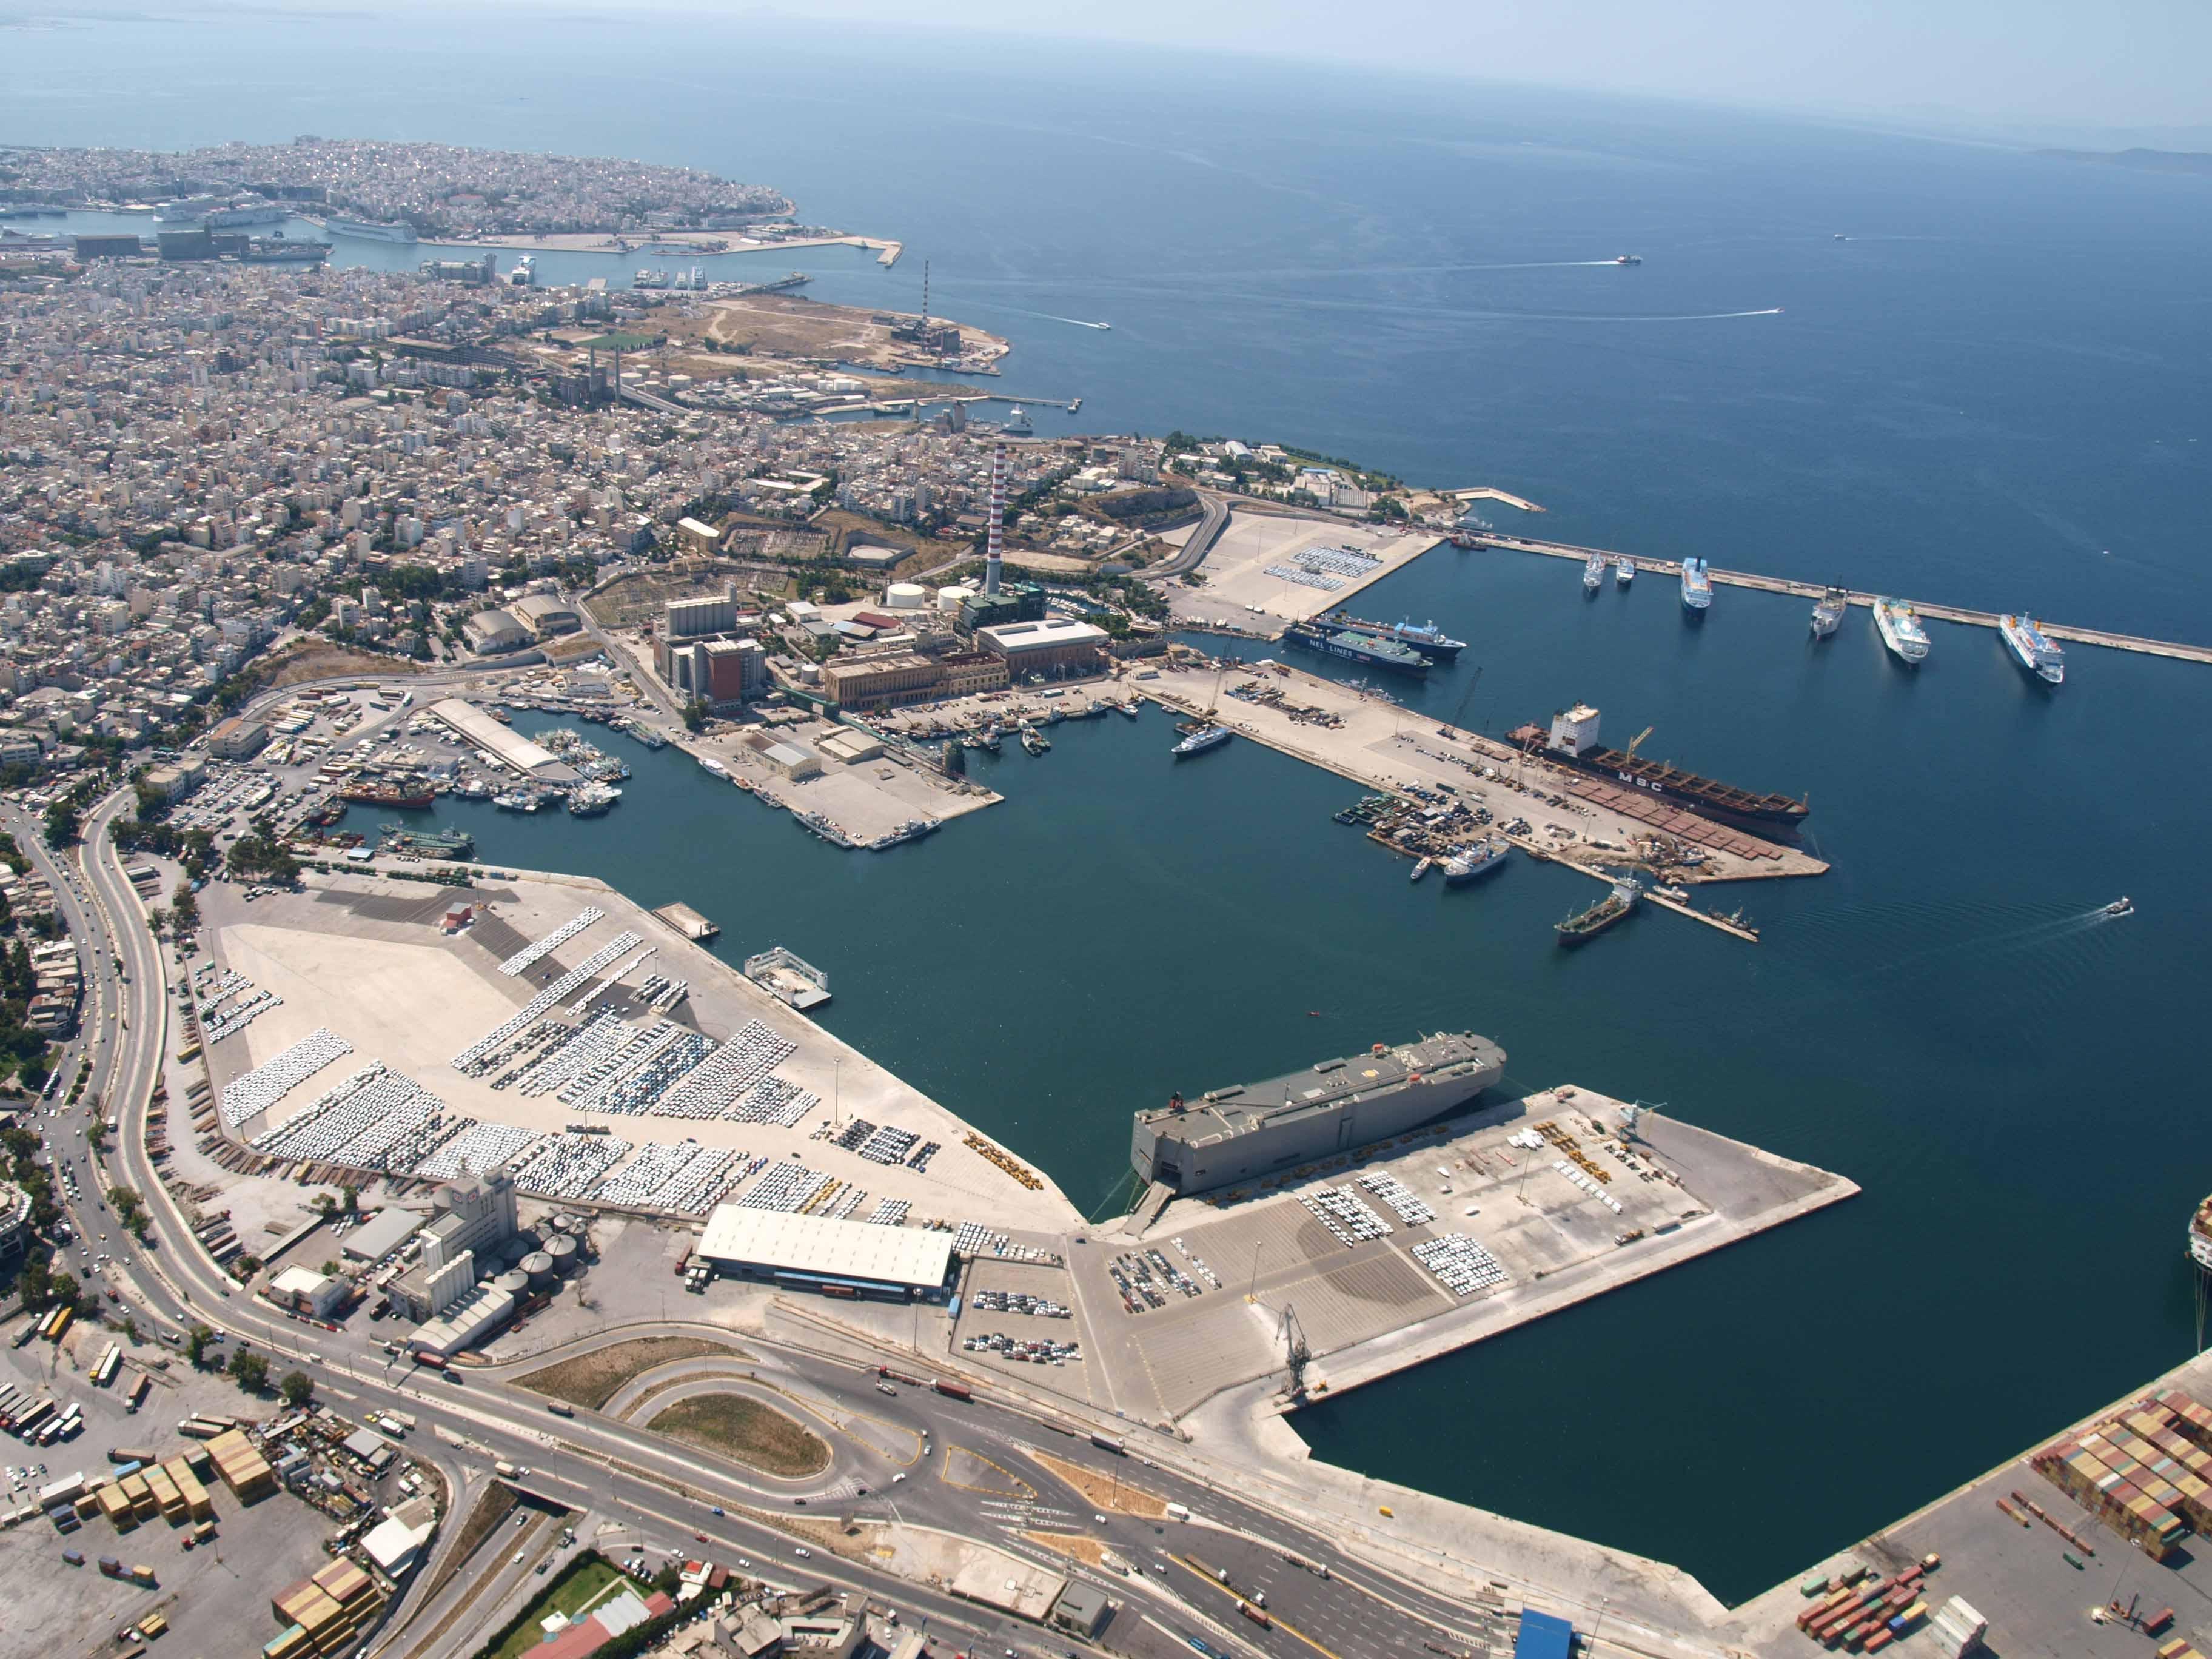 Final bid for the port of Piraeus